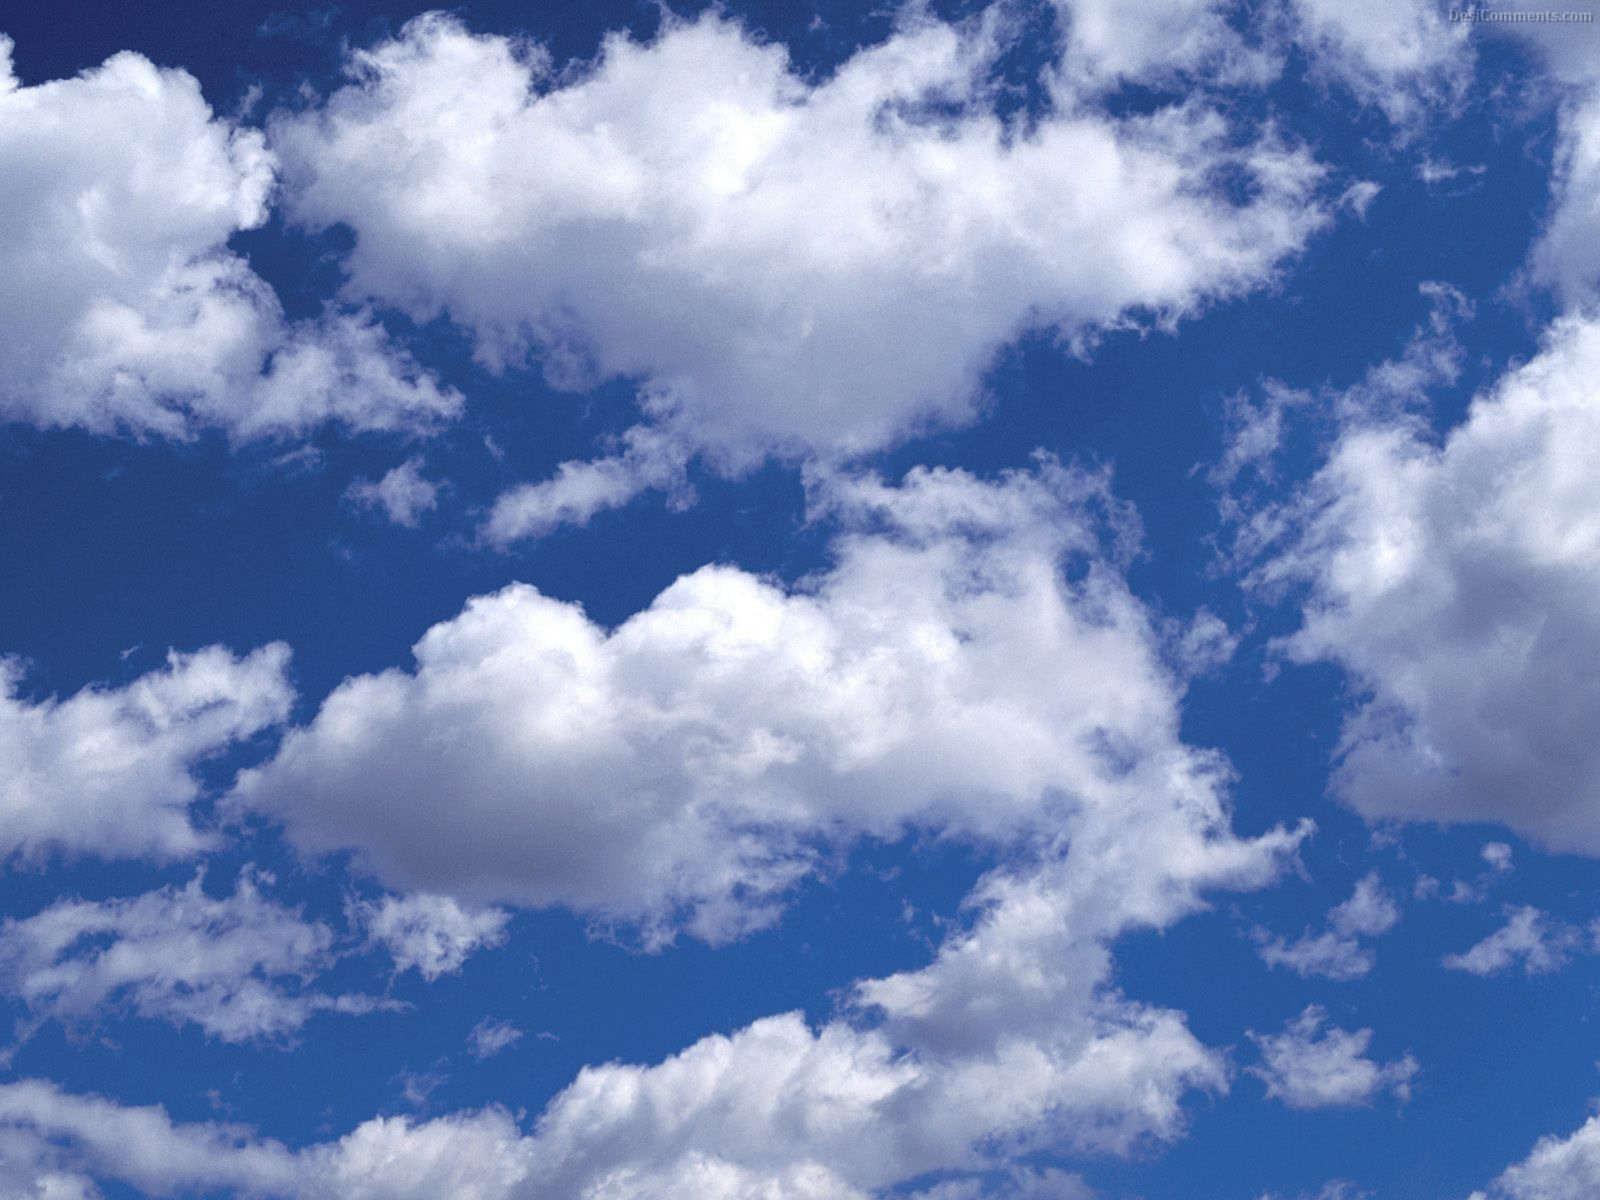 Cloud Background wallpaper | 1600x1200 | #70346